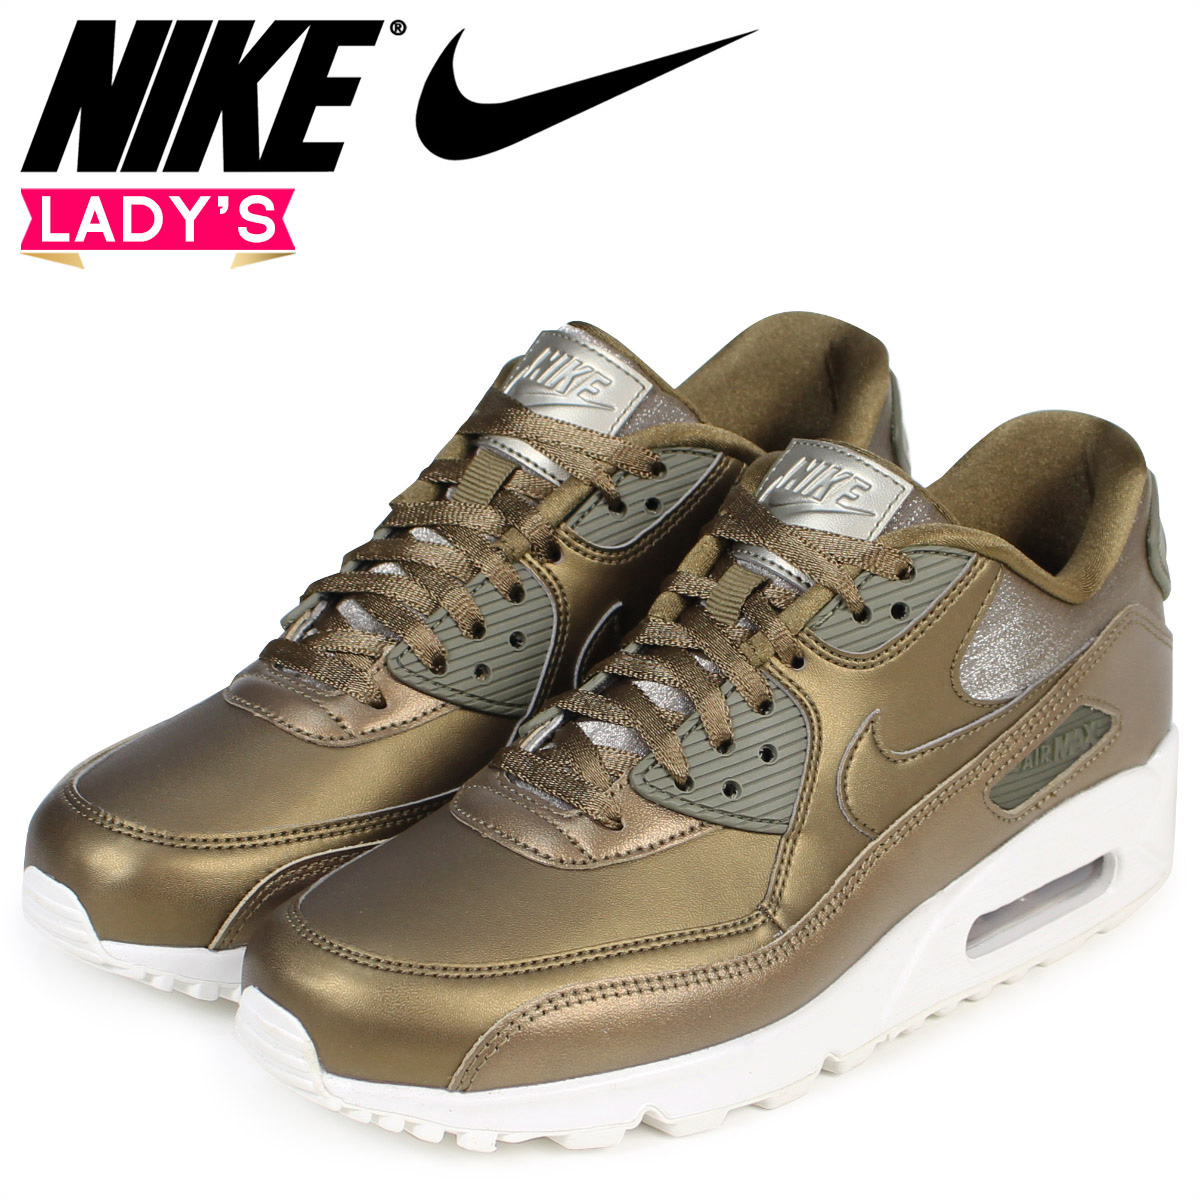 buy popular a93b6 39413 Sugar Online Shop NIKE Kie Ney AMAX 90 Ladys sneakers WMNS AIR MAX 90  PREMIUM 896,497-901 shoes brown 1023 Shinnyu load  Rakuten Global Market